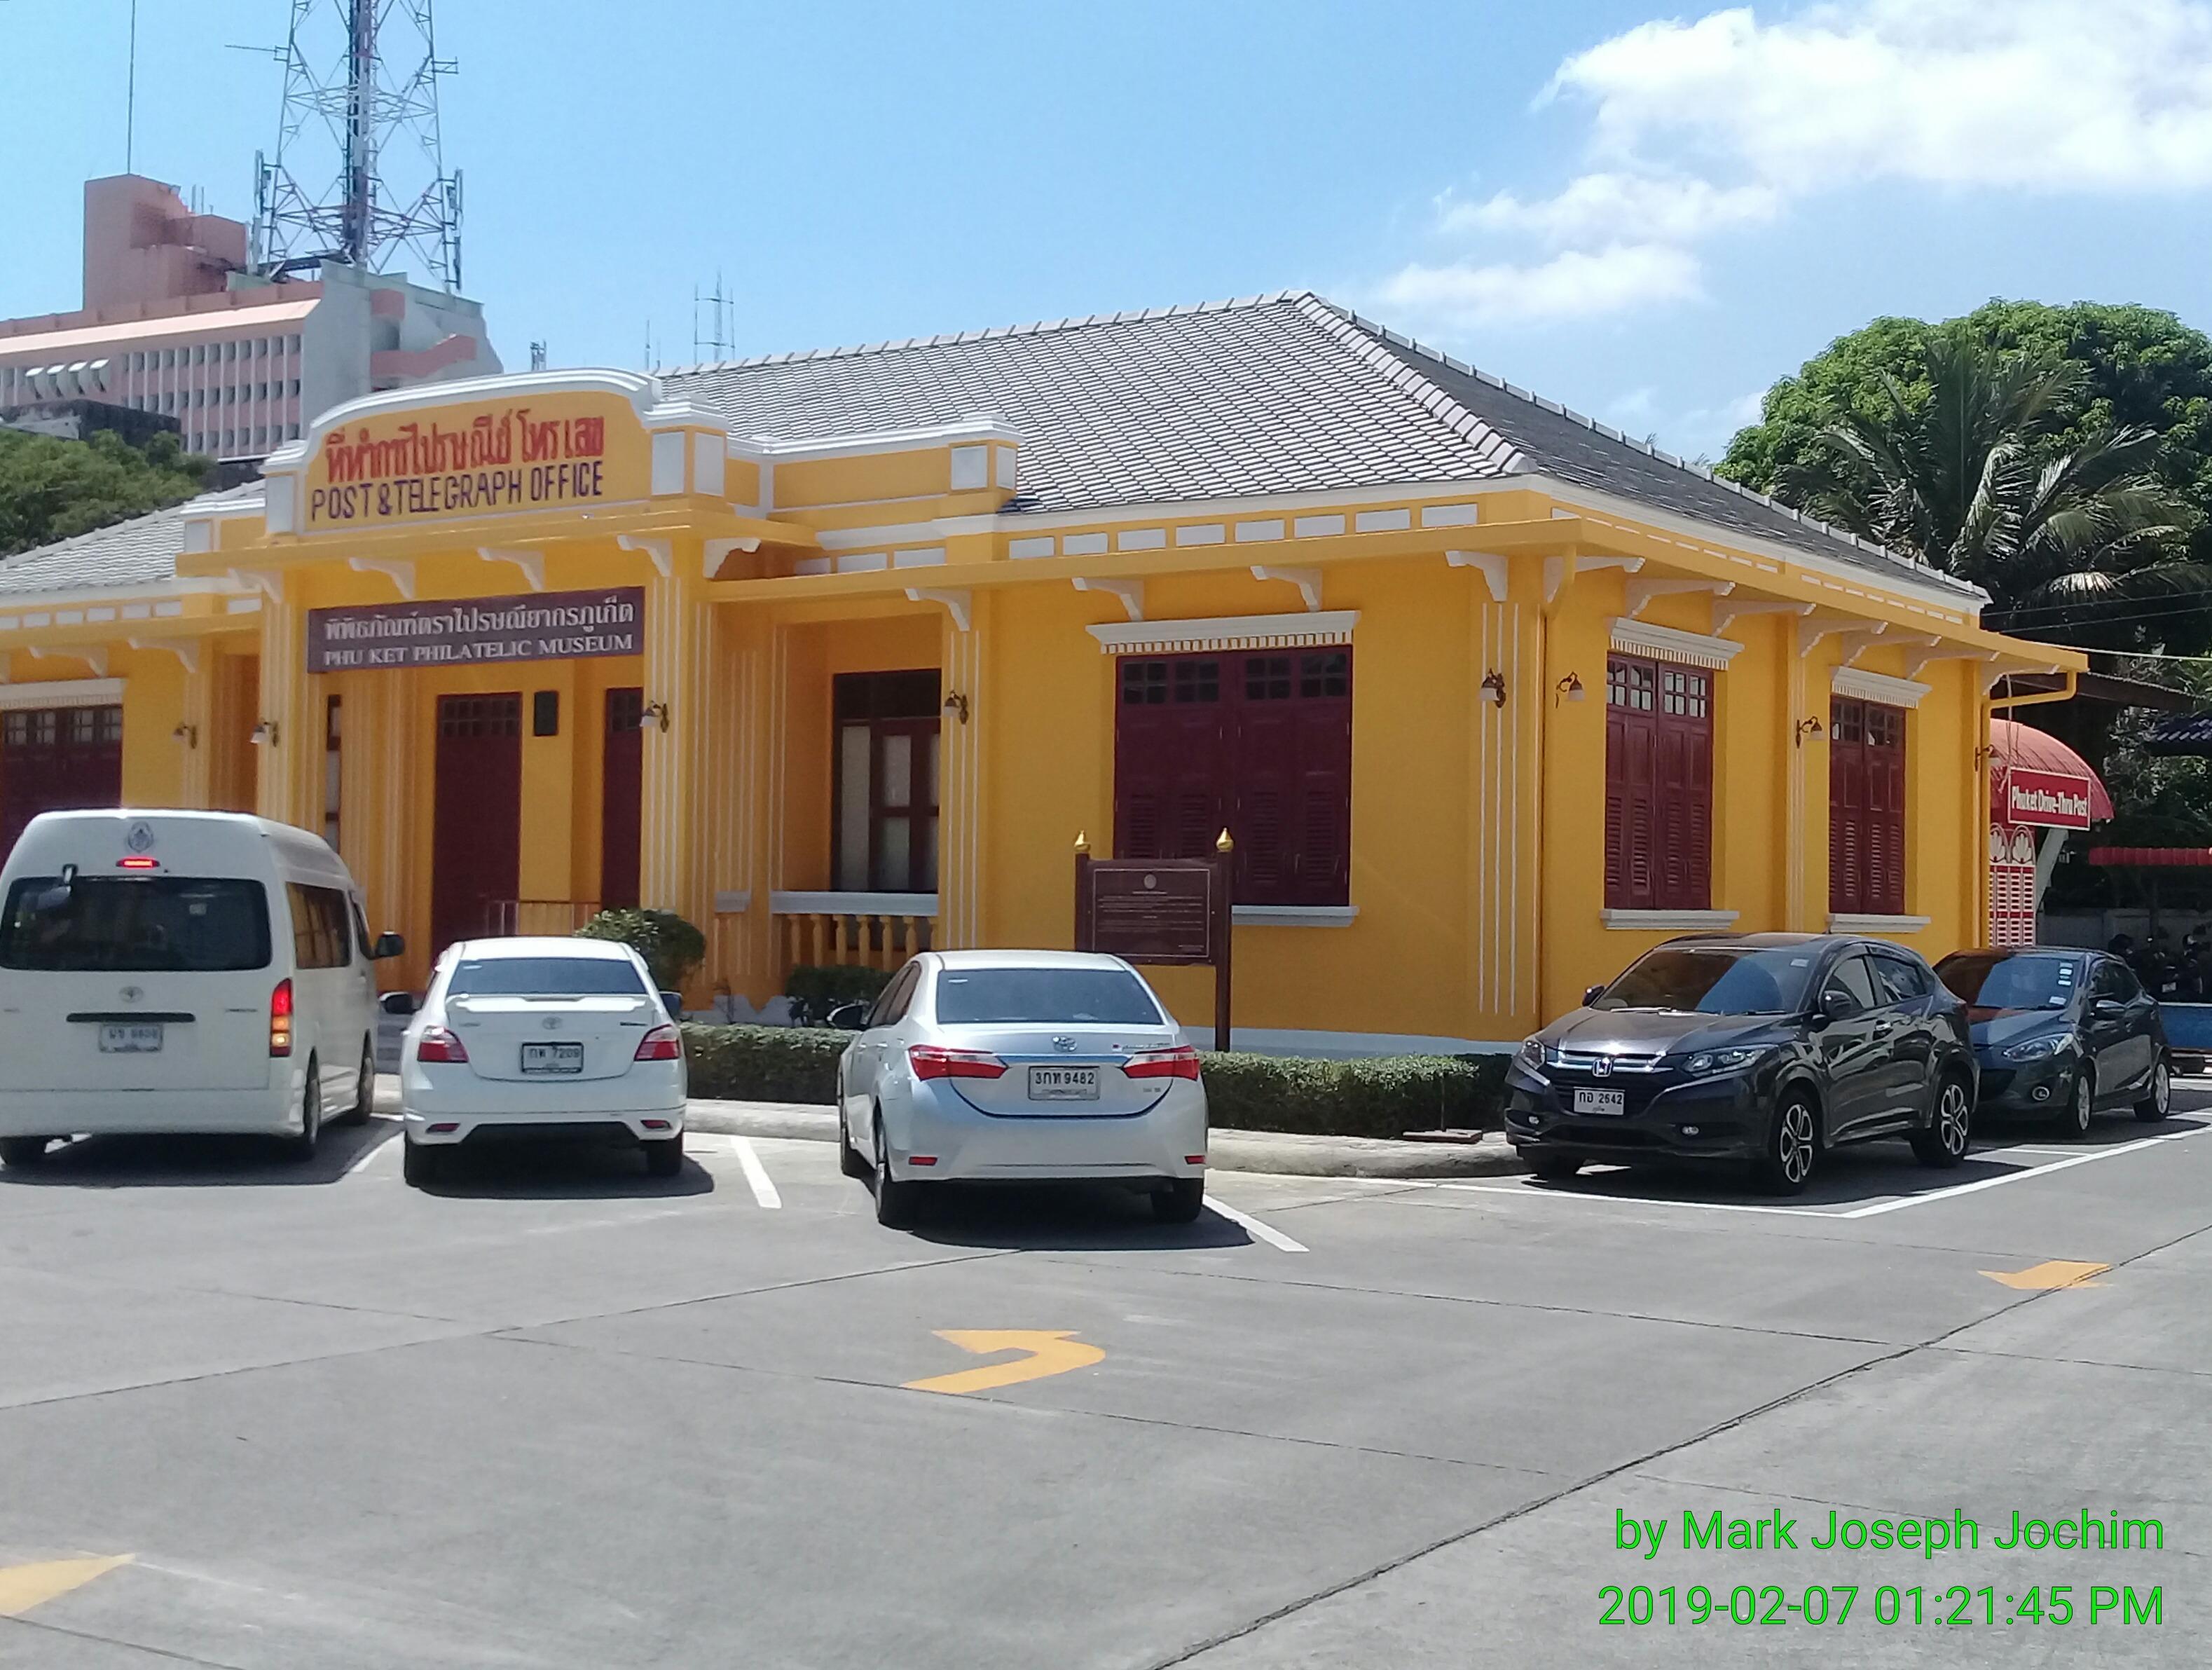 The Phuket Philatelic Museum will reopen the week of February 11, 2019.